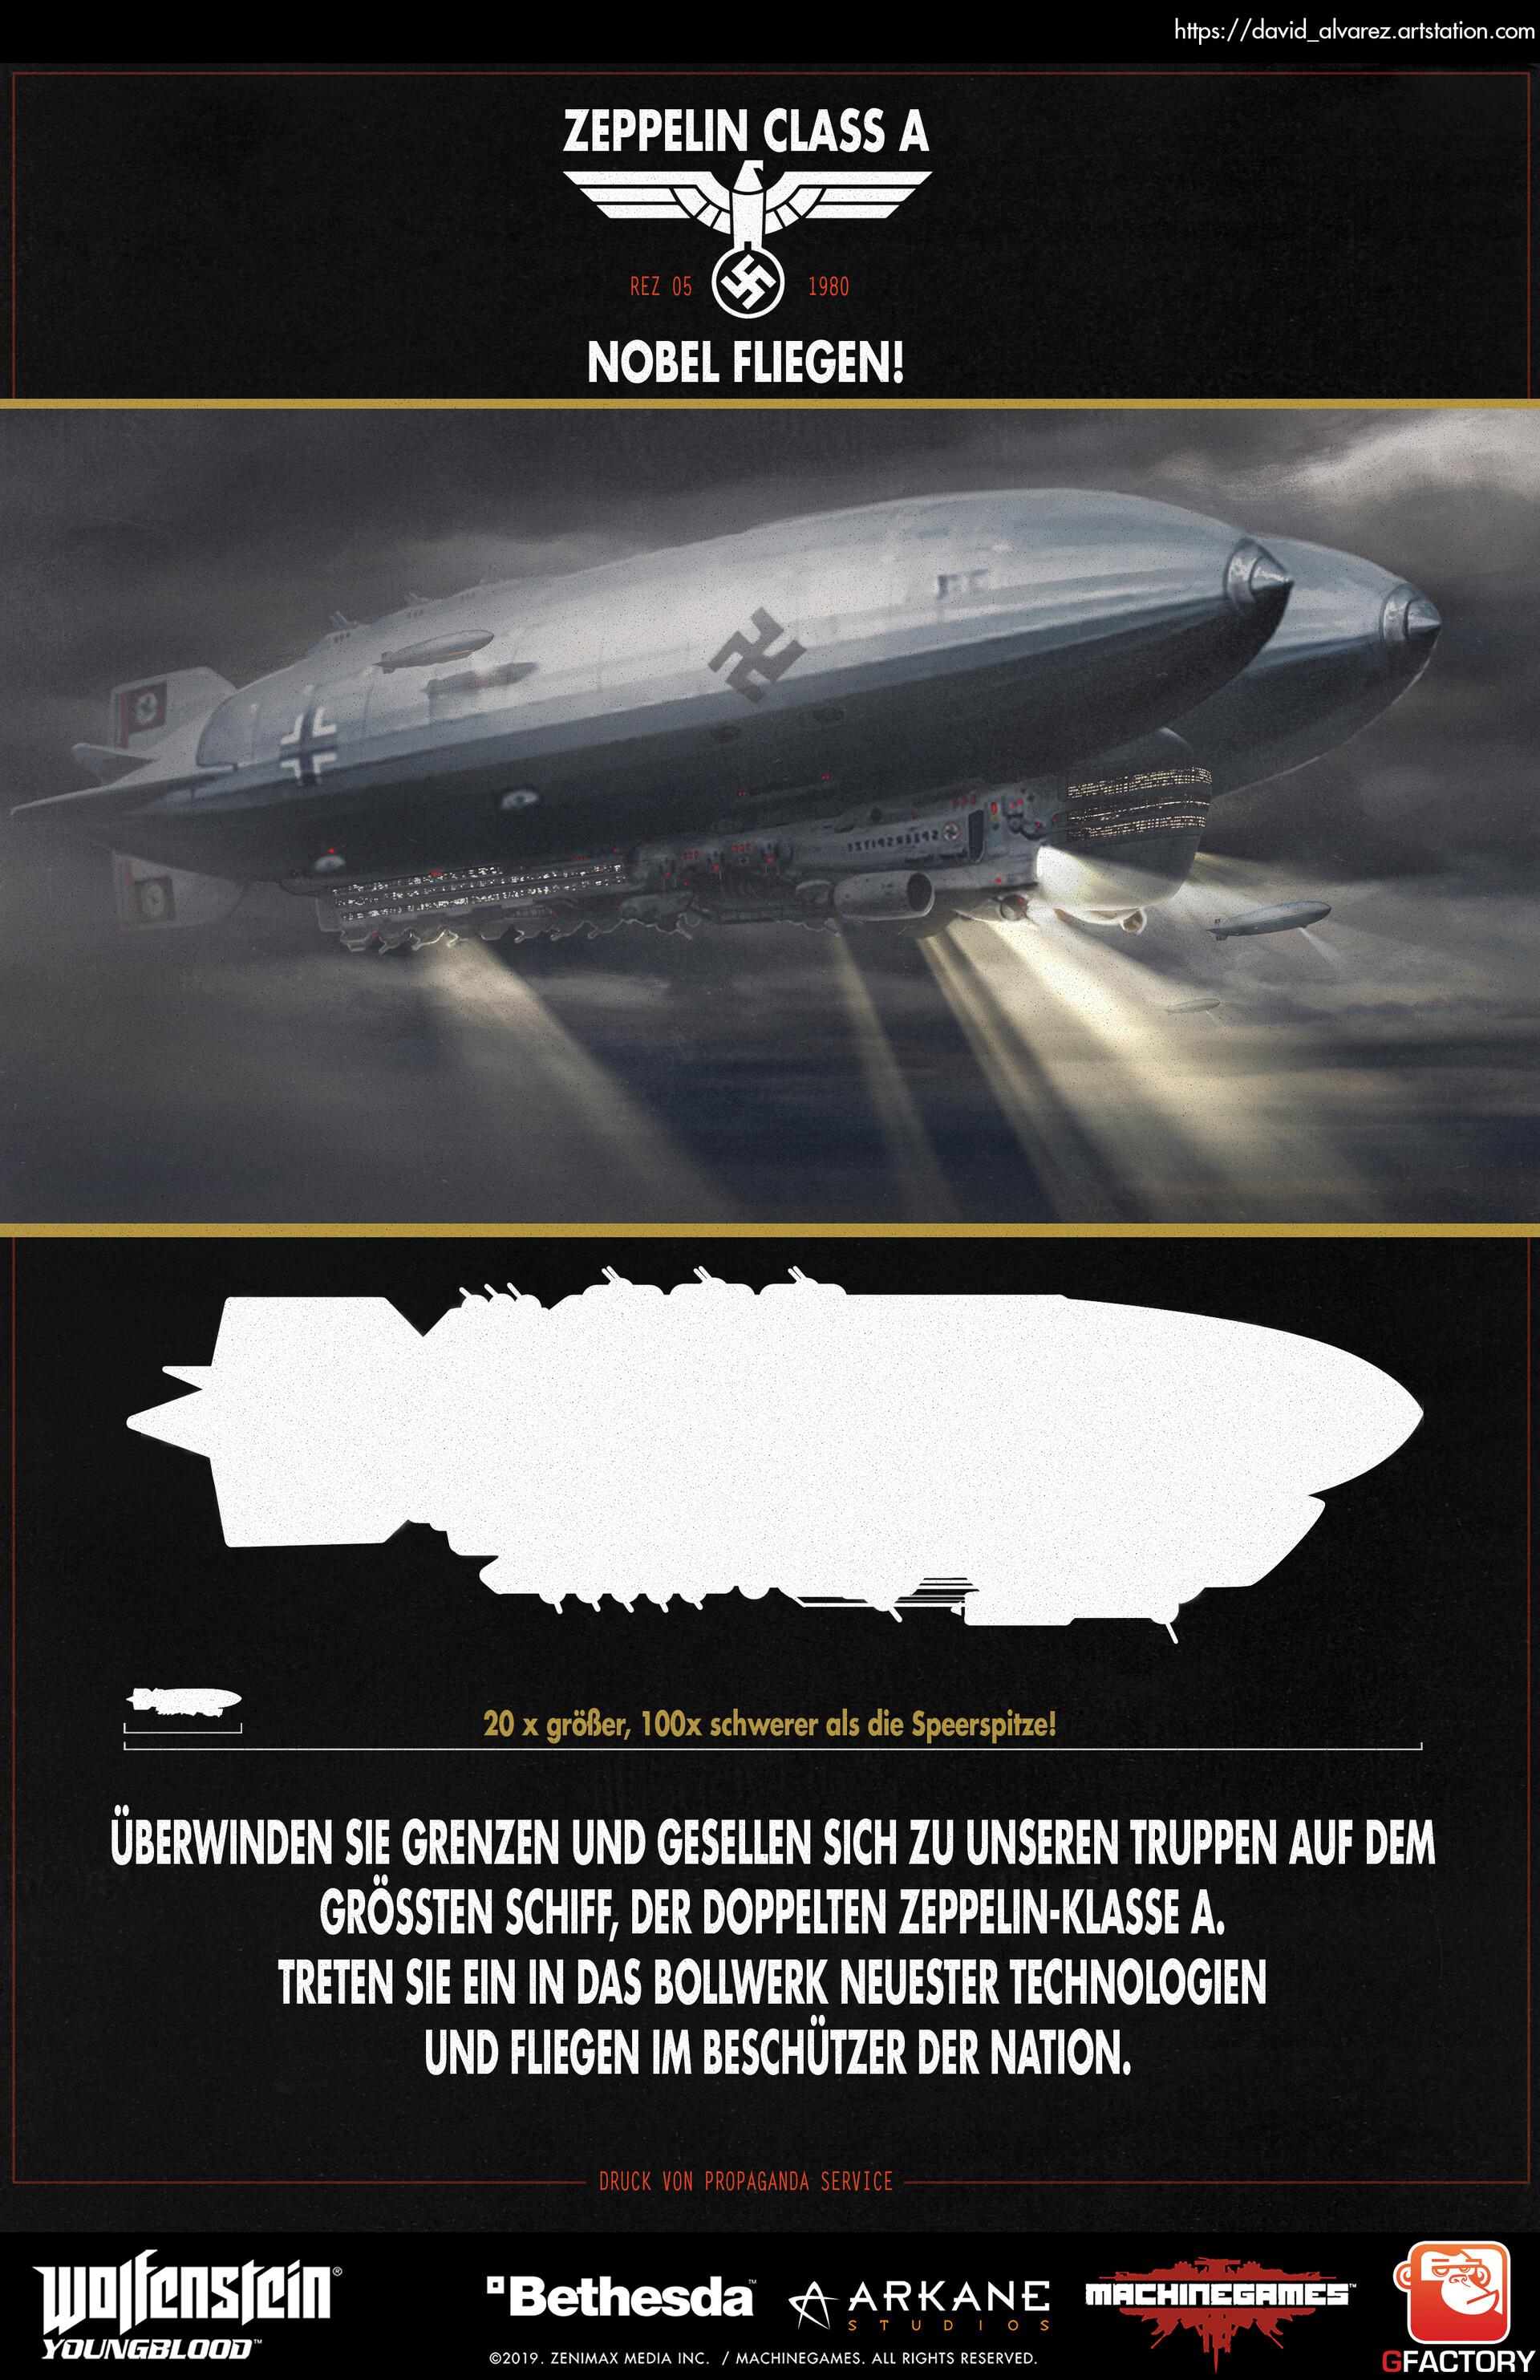 David alvarez dalvarez gf mg yb posters 02